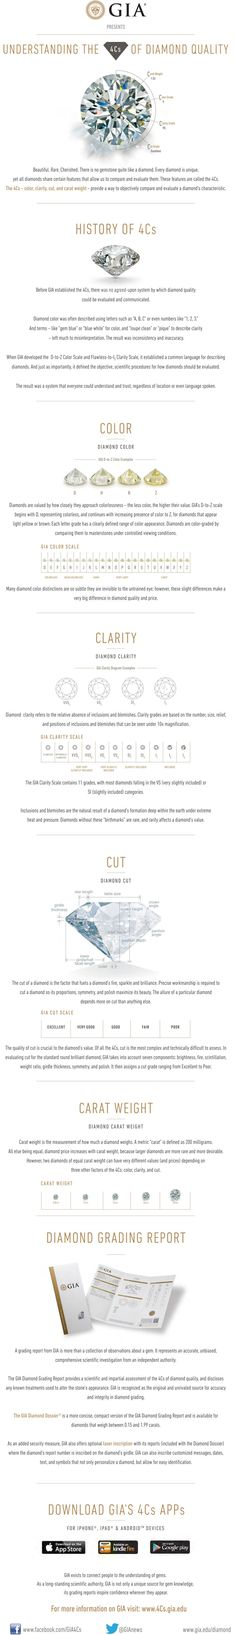 Know your Diamonds - 4Cs Diamond Quality Infographic